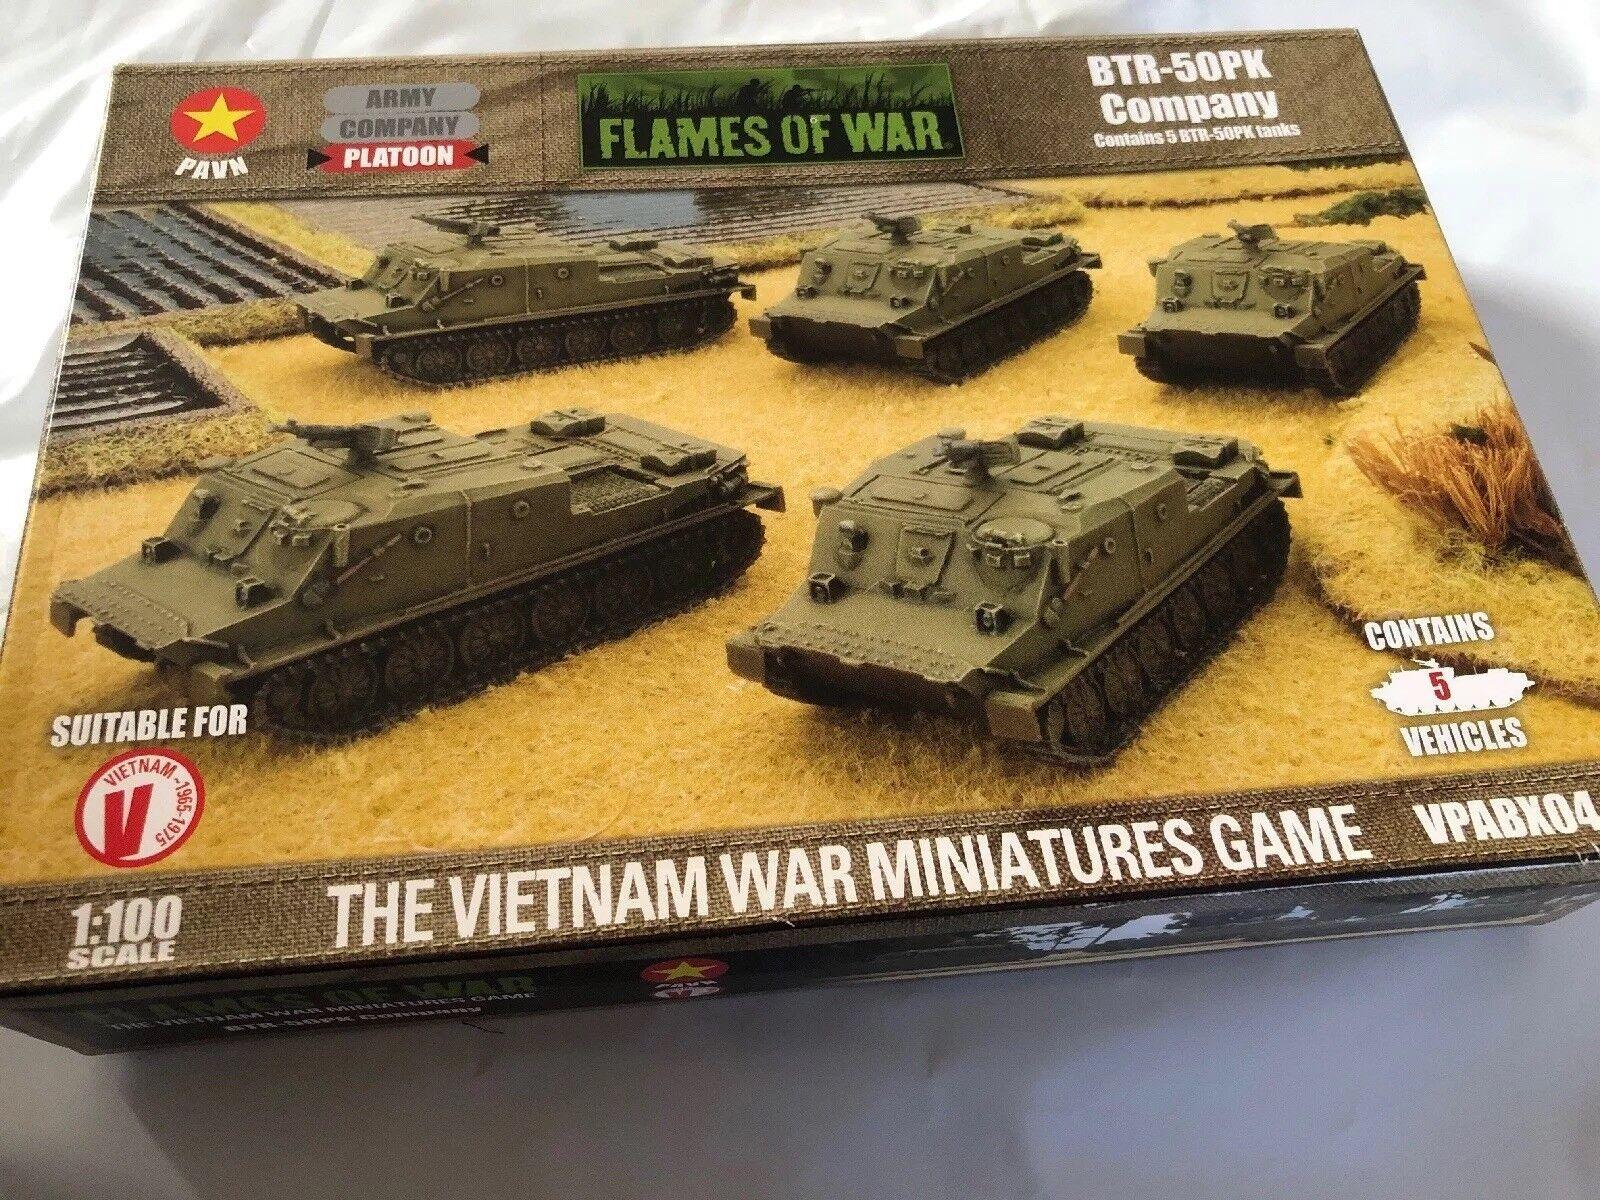 Flames of War BTR-50PK Empresa VPABX 04